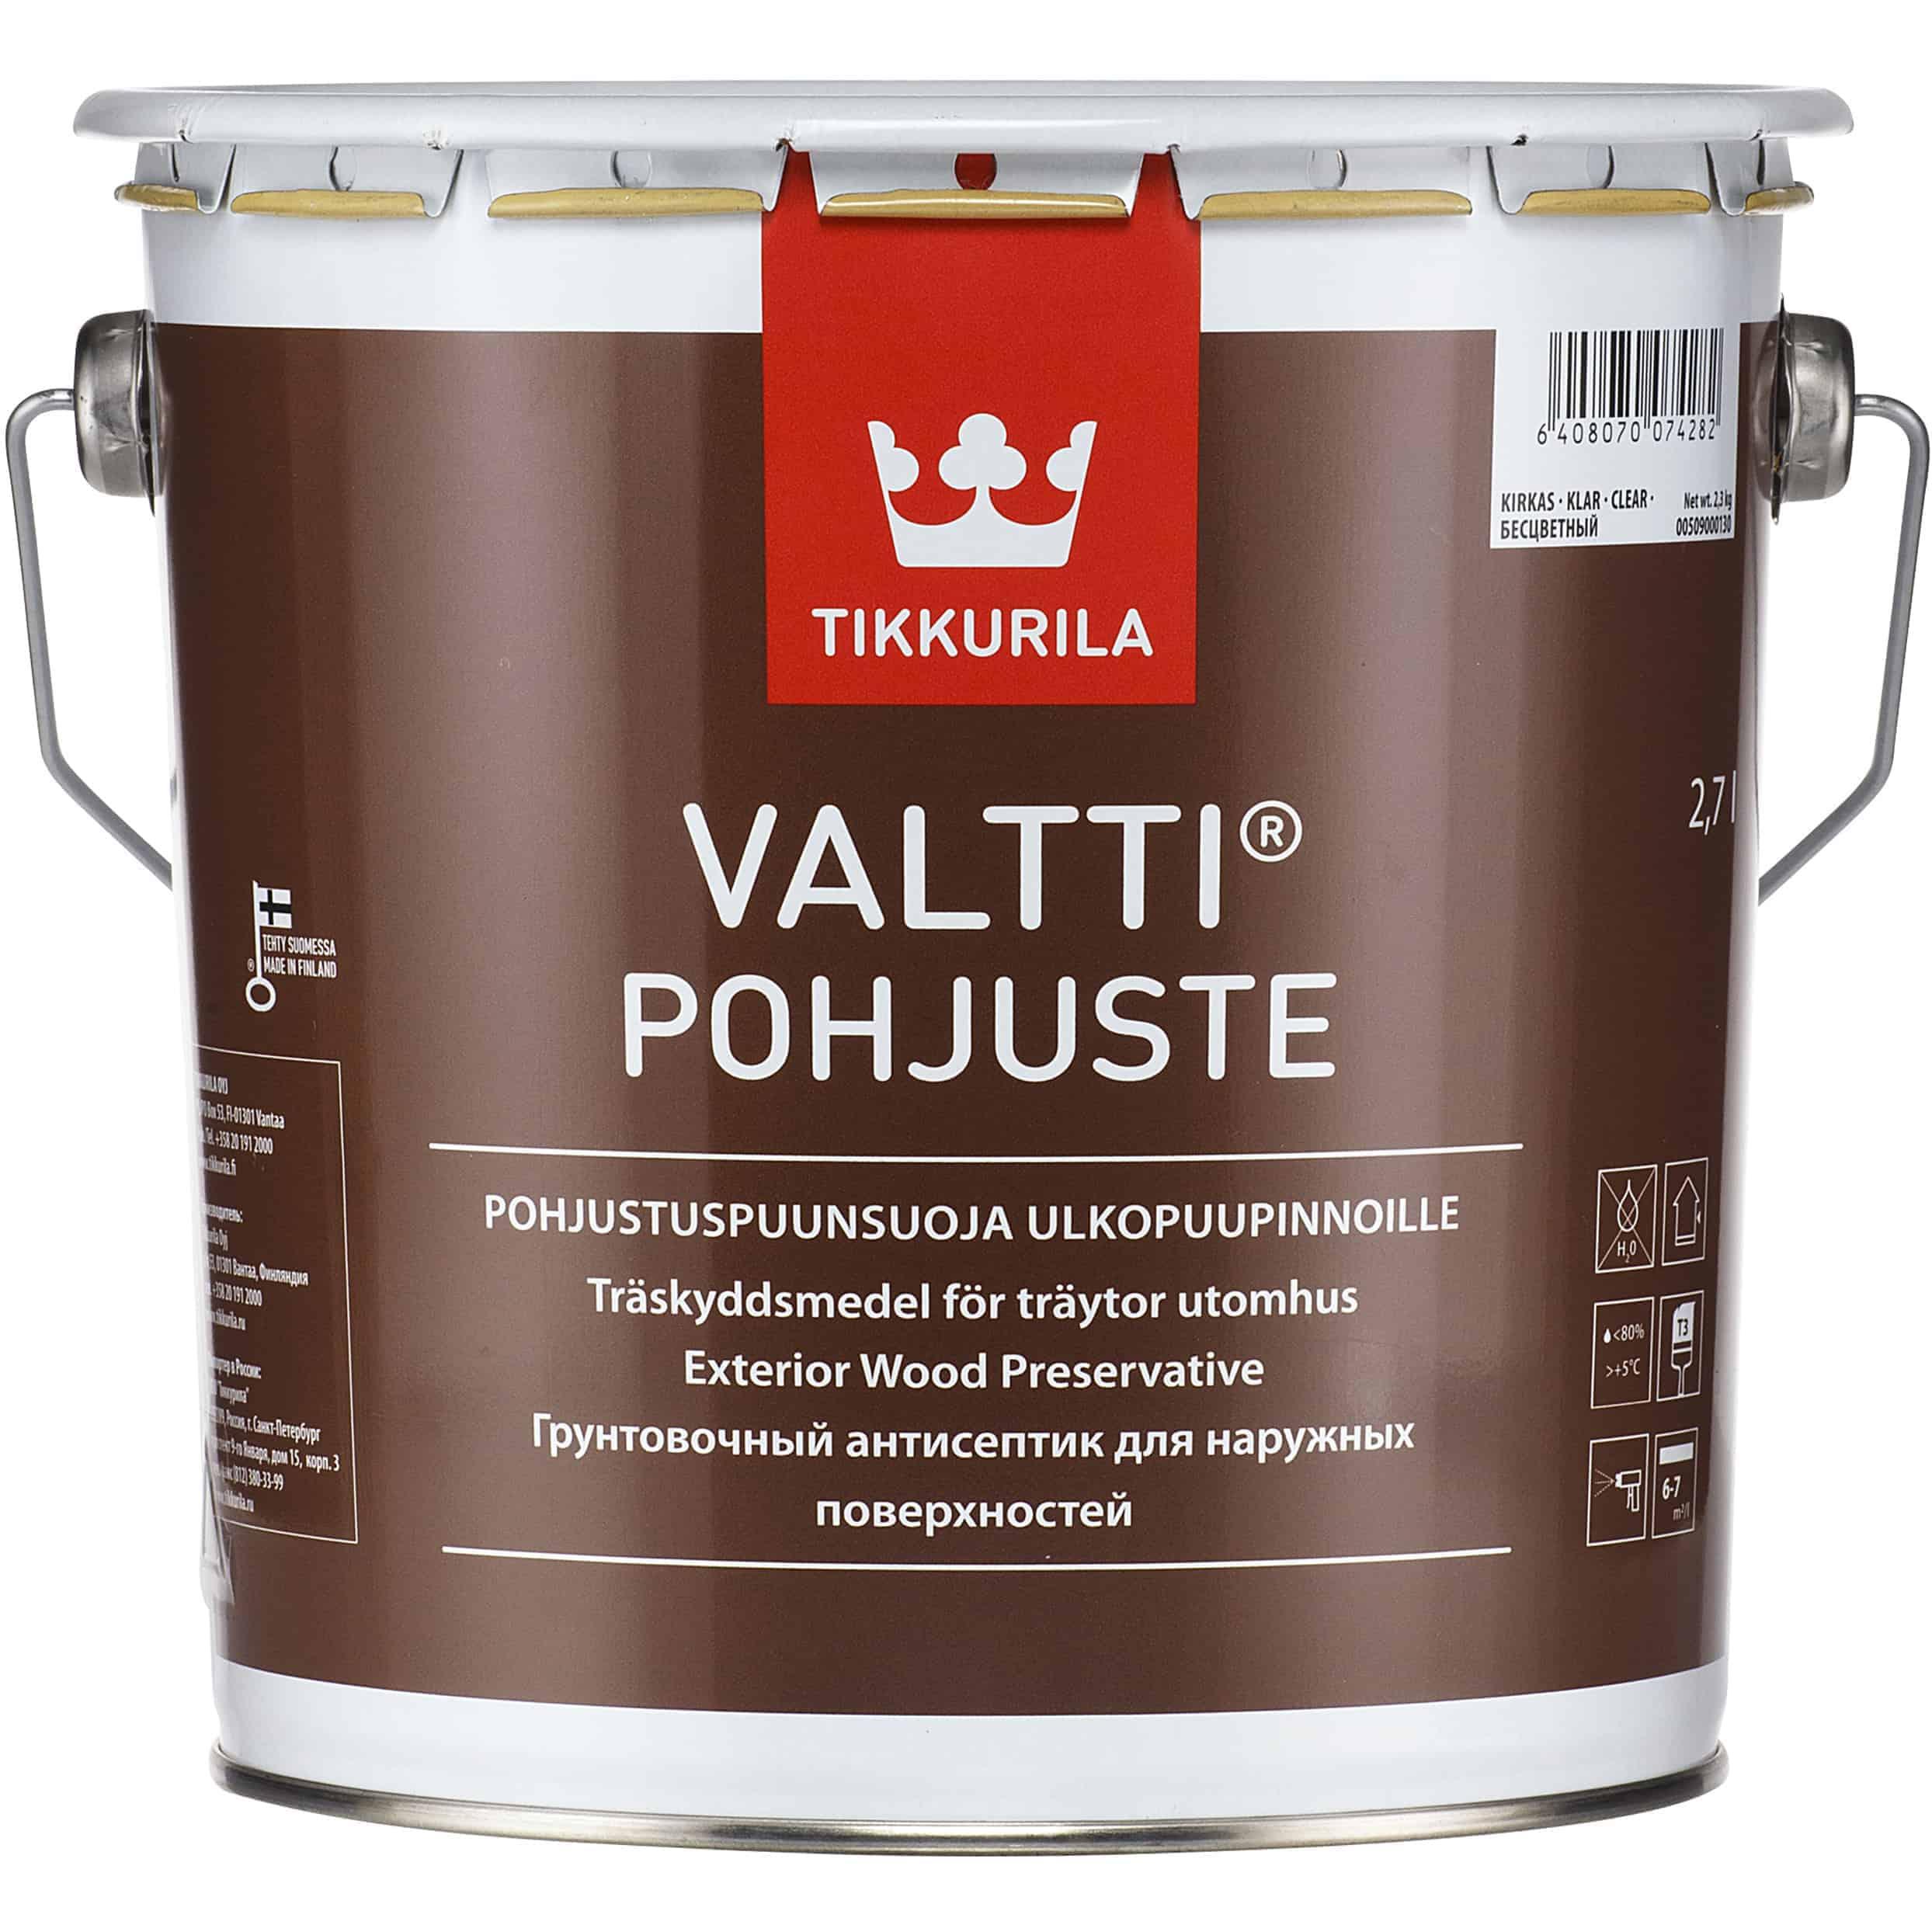 VALTTI POHJUSTE VÄRITÖN 2